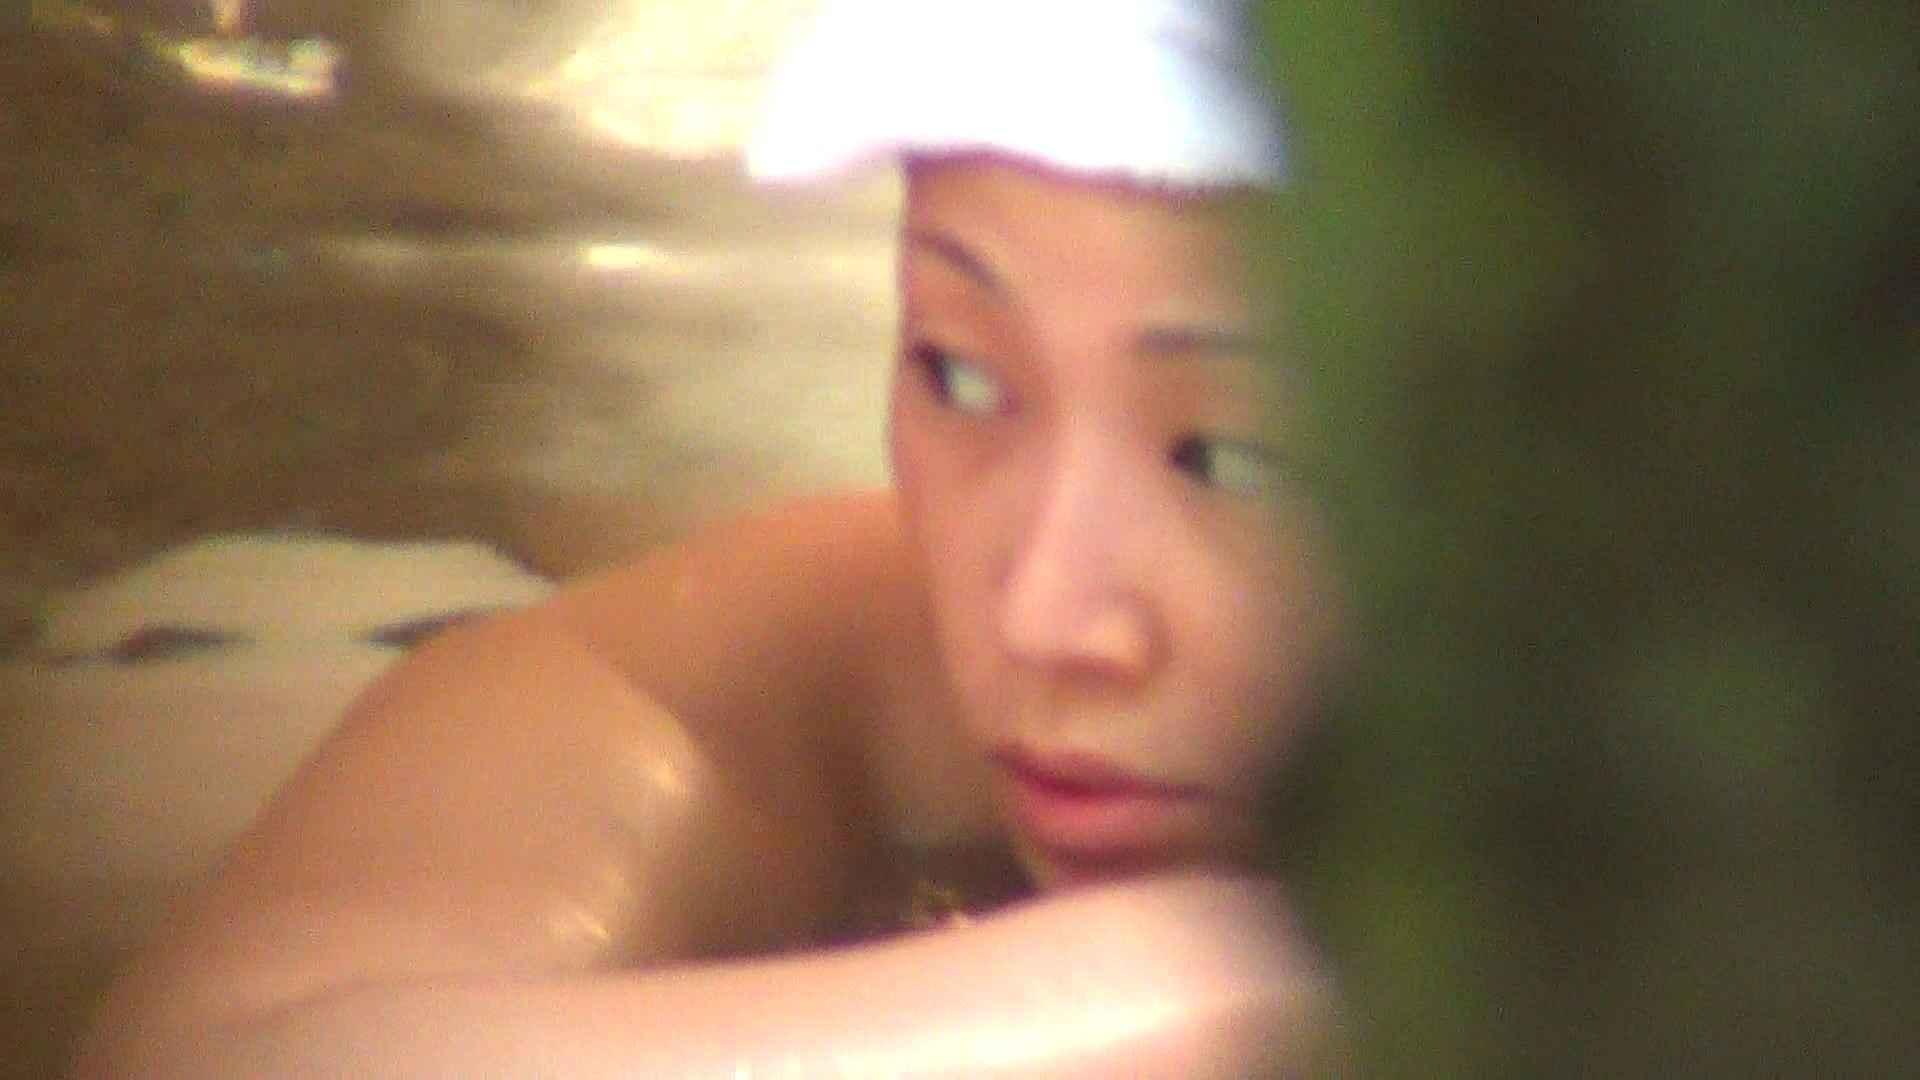 Aquaな露天風呂Vol.281 露天風呂 すけべAV動画紹介 57連発 23